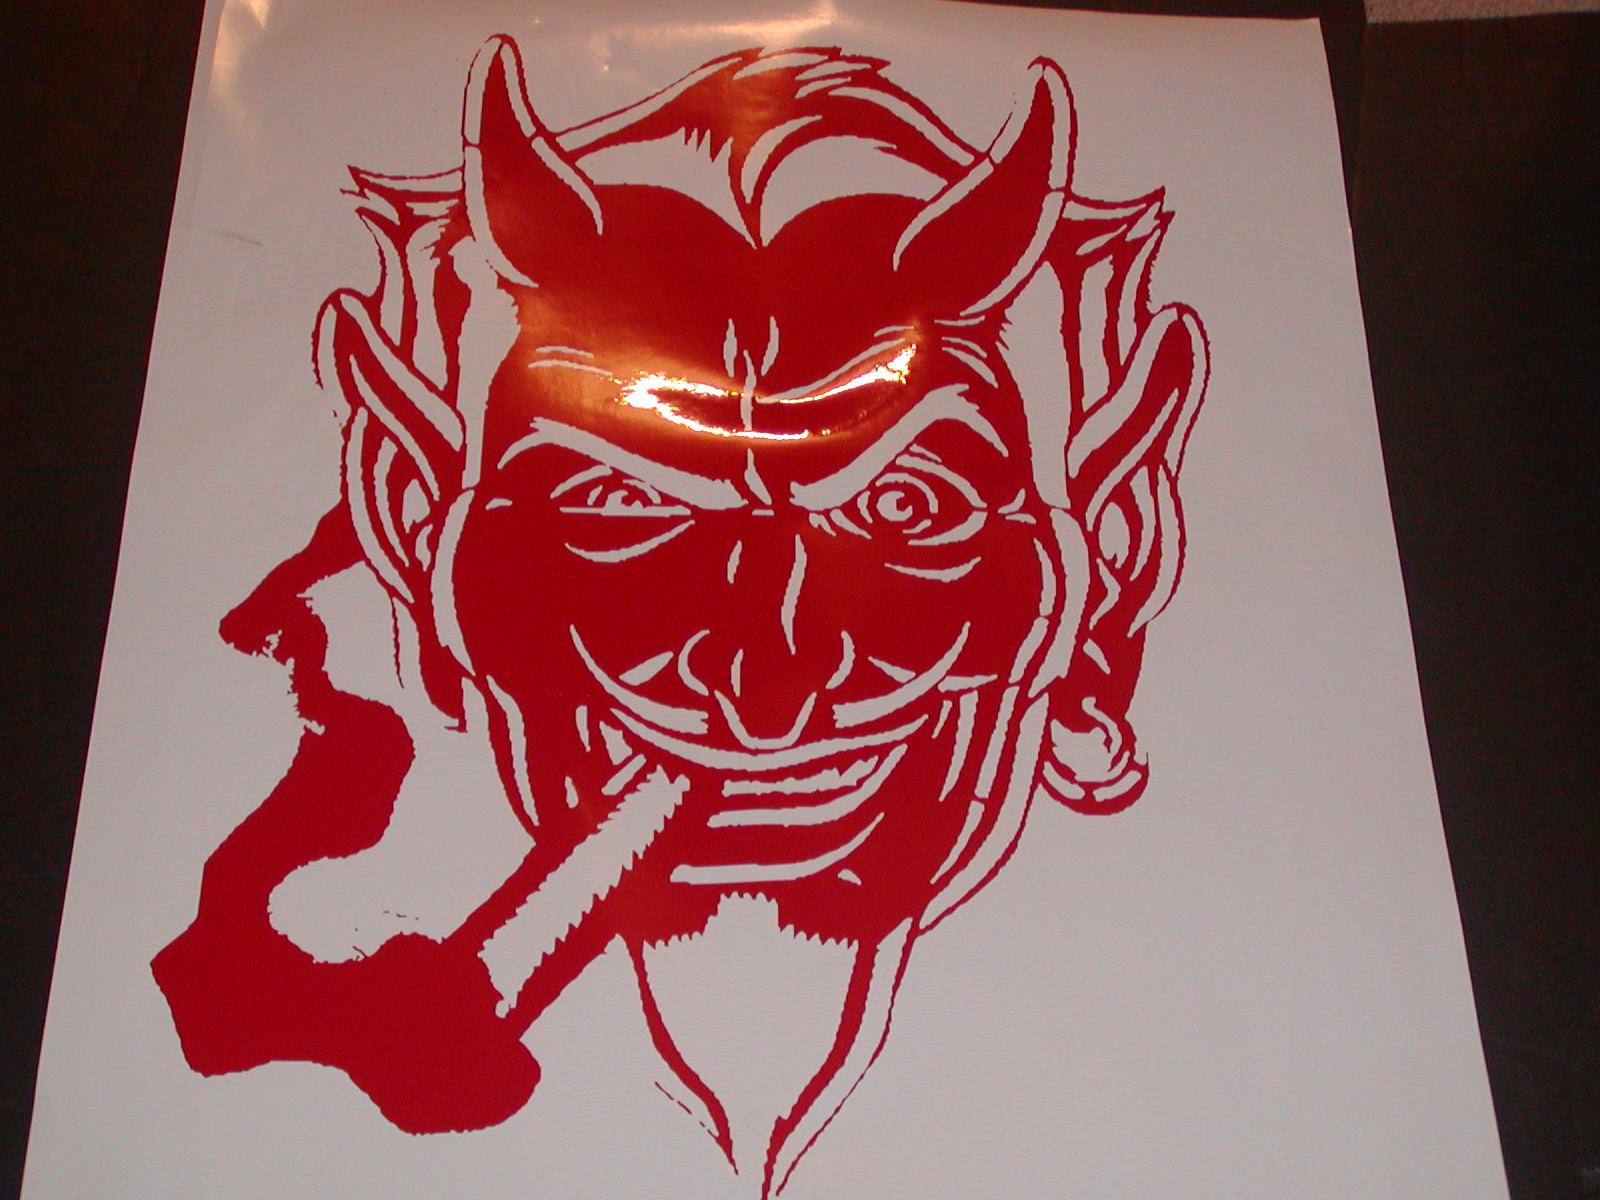 Devil Smile Old School Hot Rod Hood Graphic